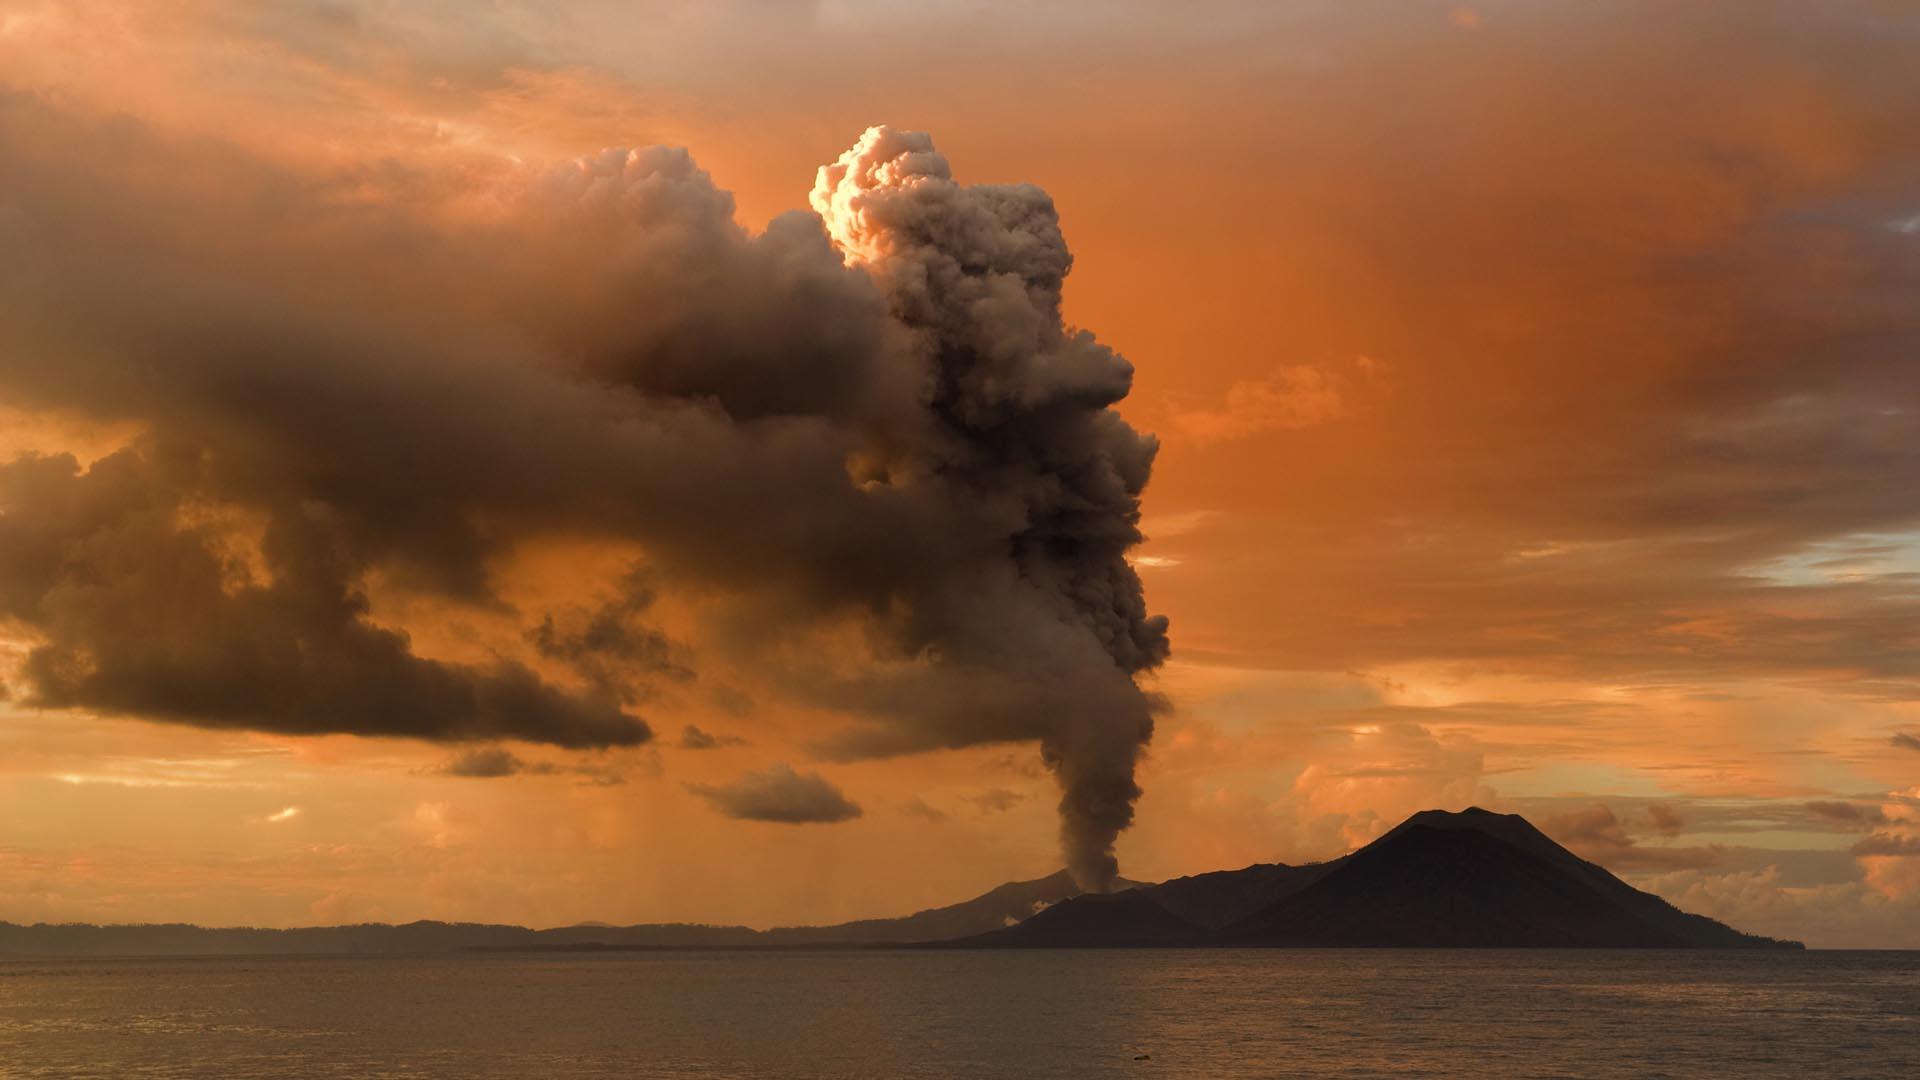 Volcano At Sunset HD Wallpaper FullHDWpp   Full HD Wallpapers 1920x1080